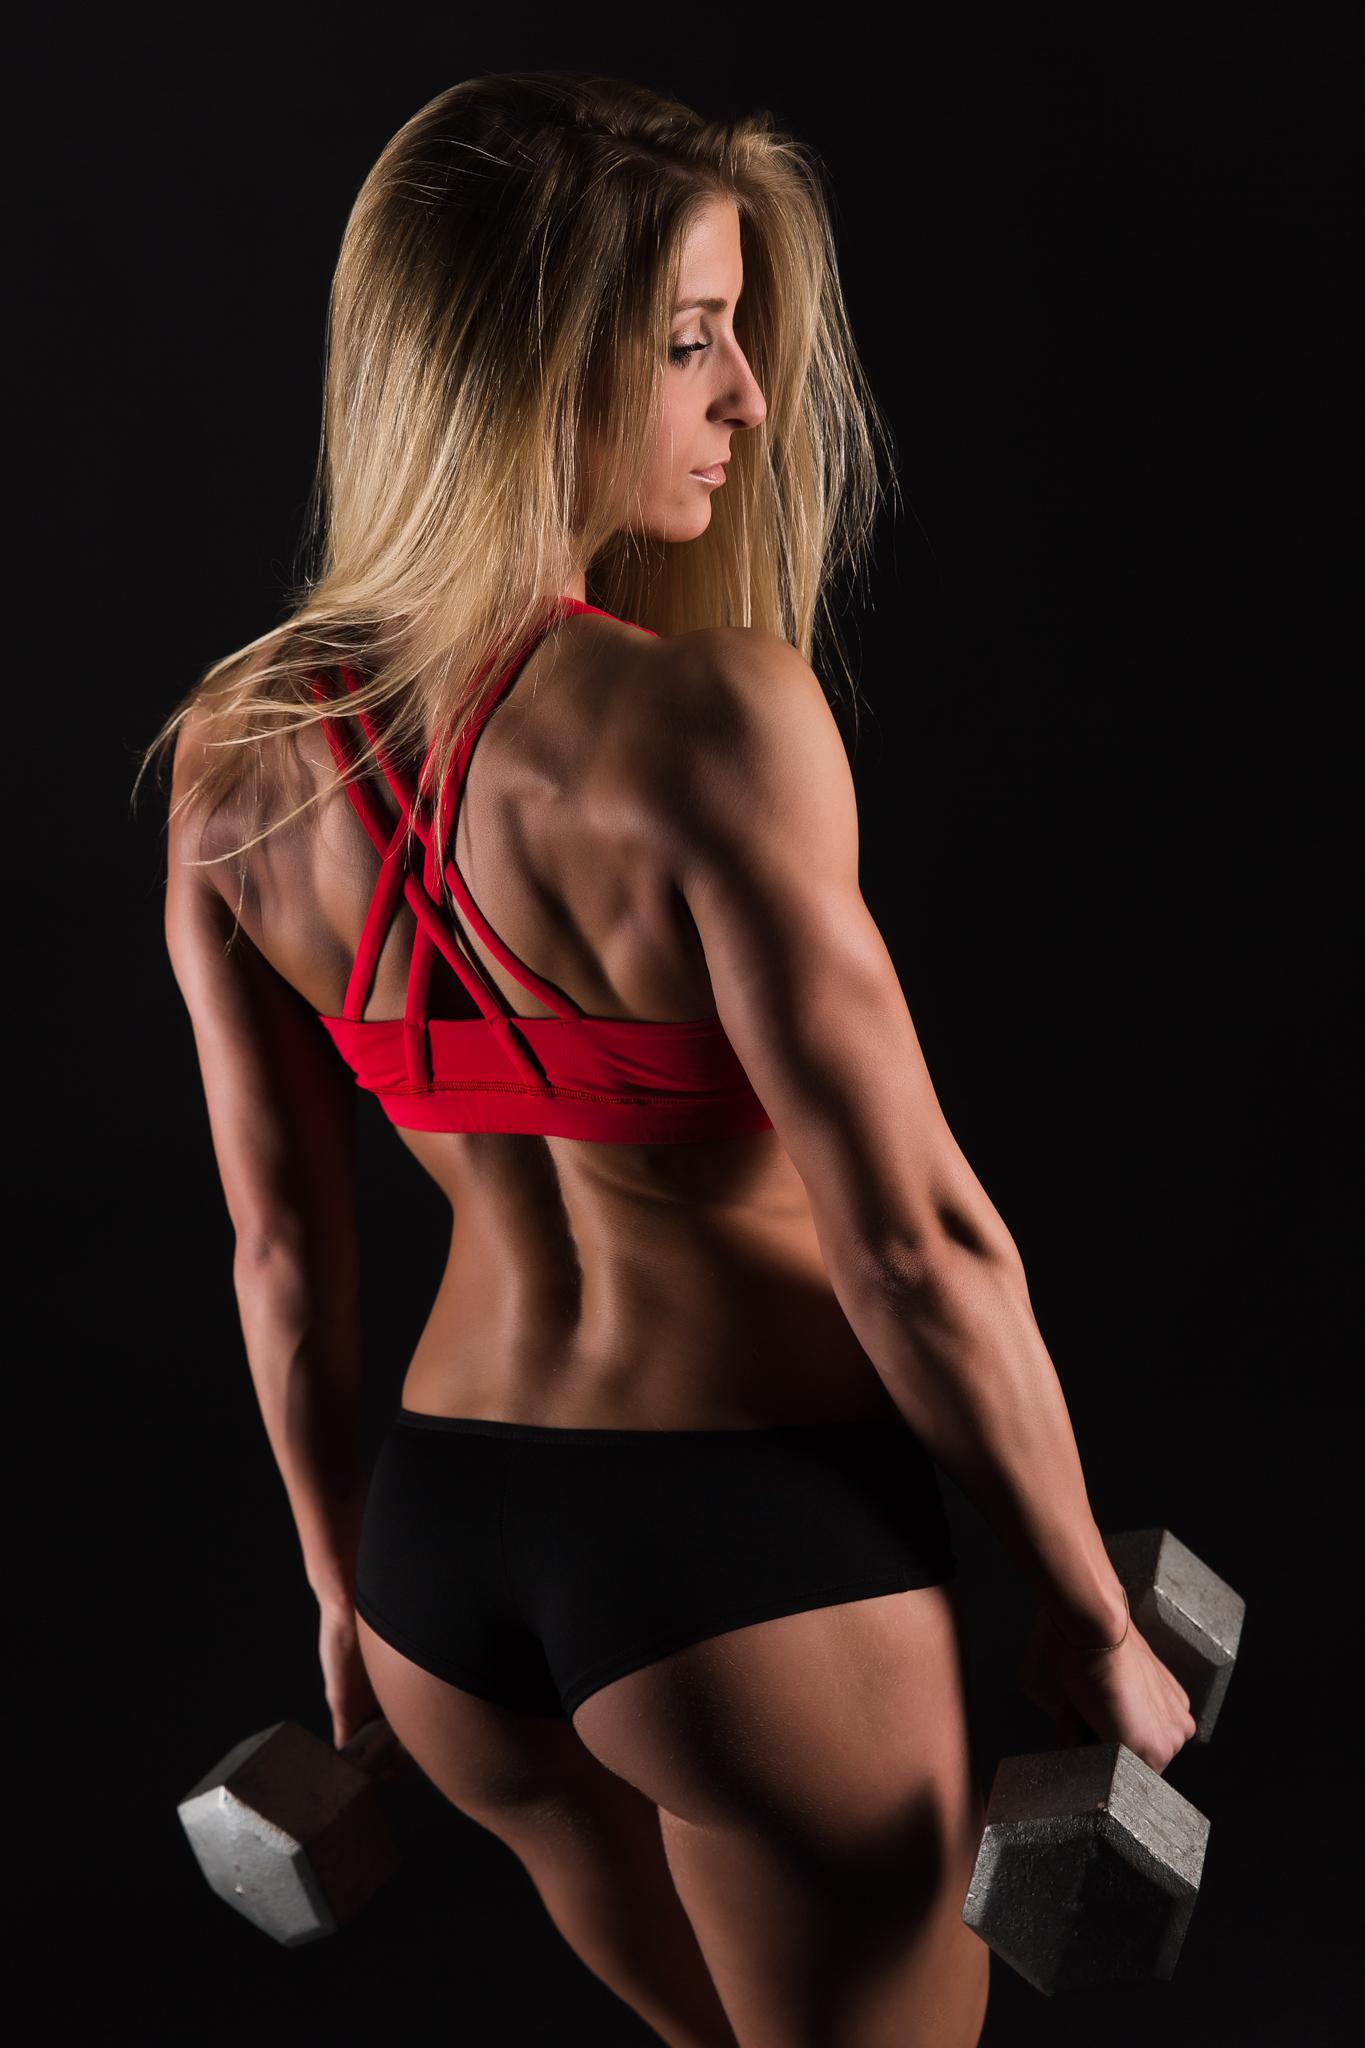 dover-new-hampshire-boston-fitness-photographer-photography-studio-04.jpg